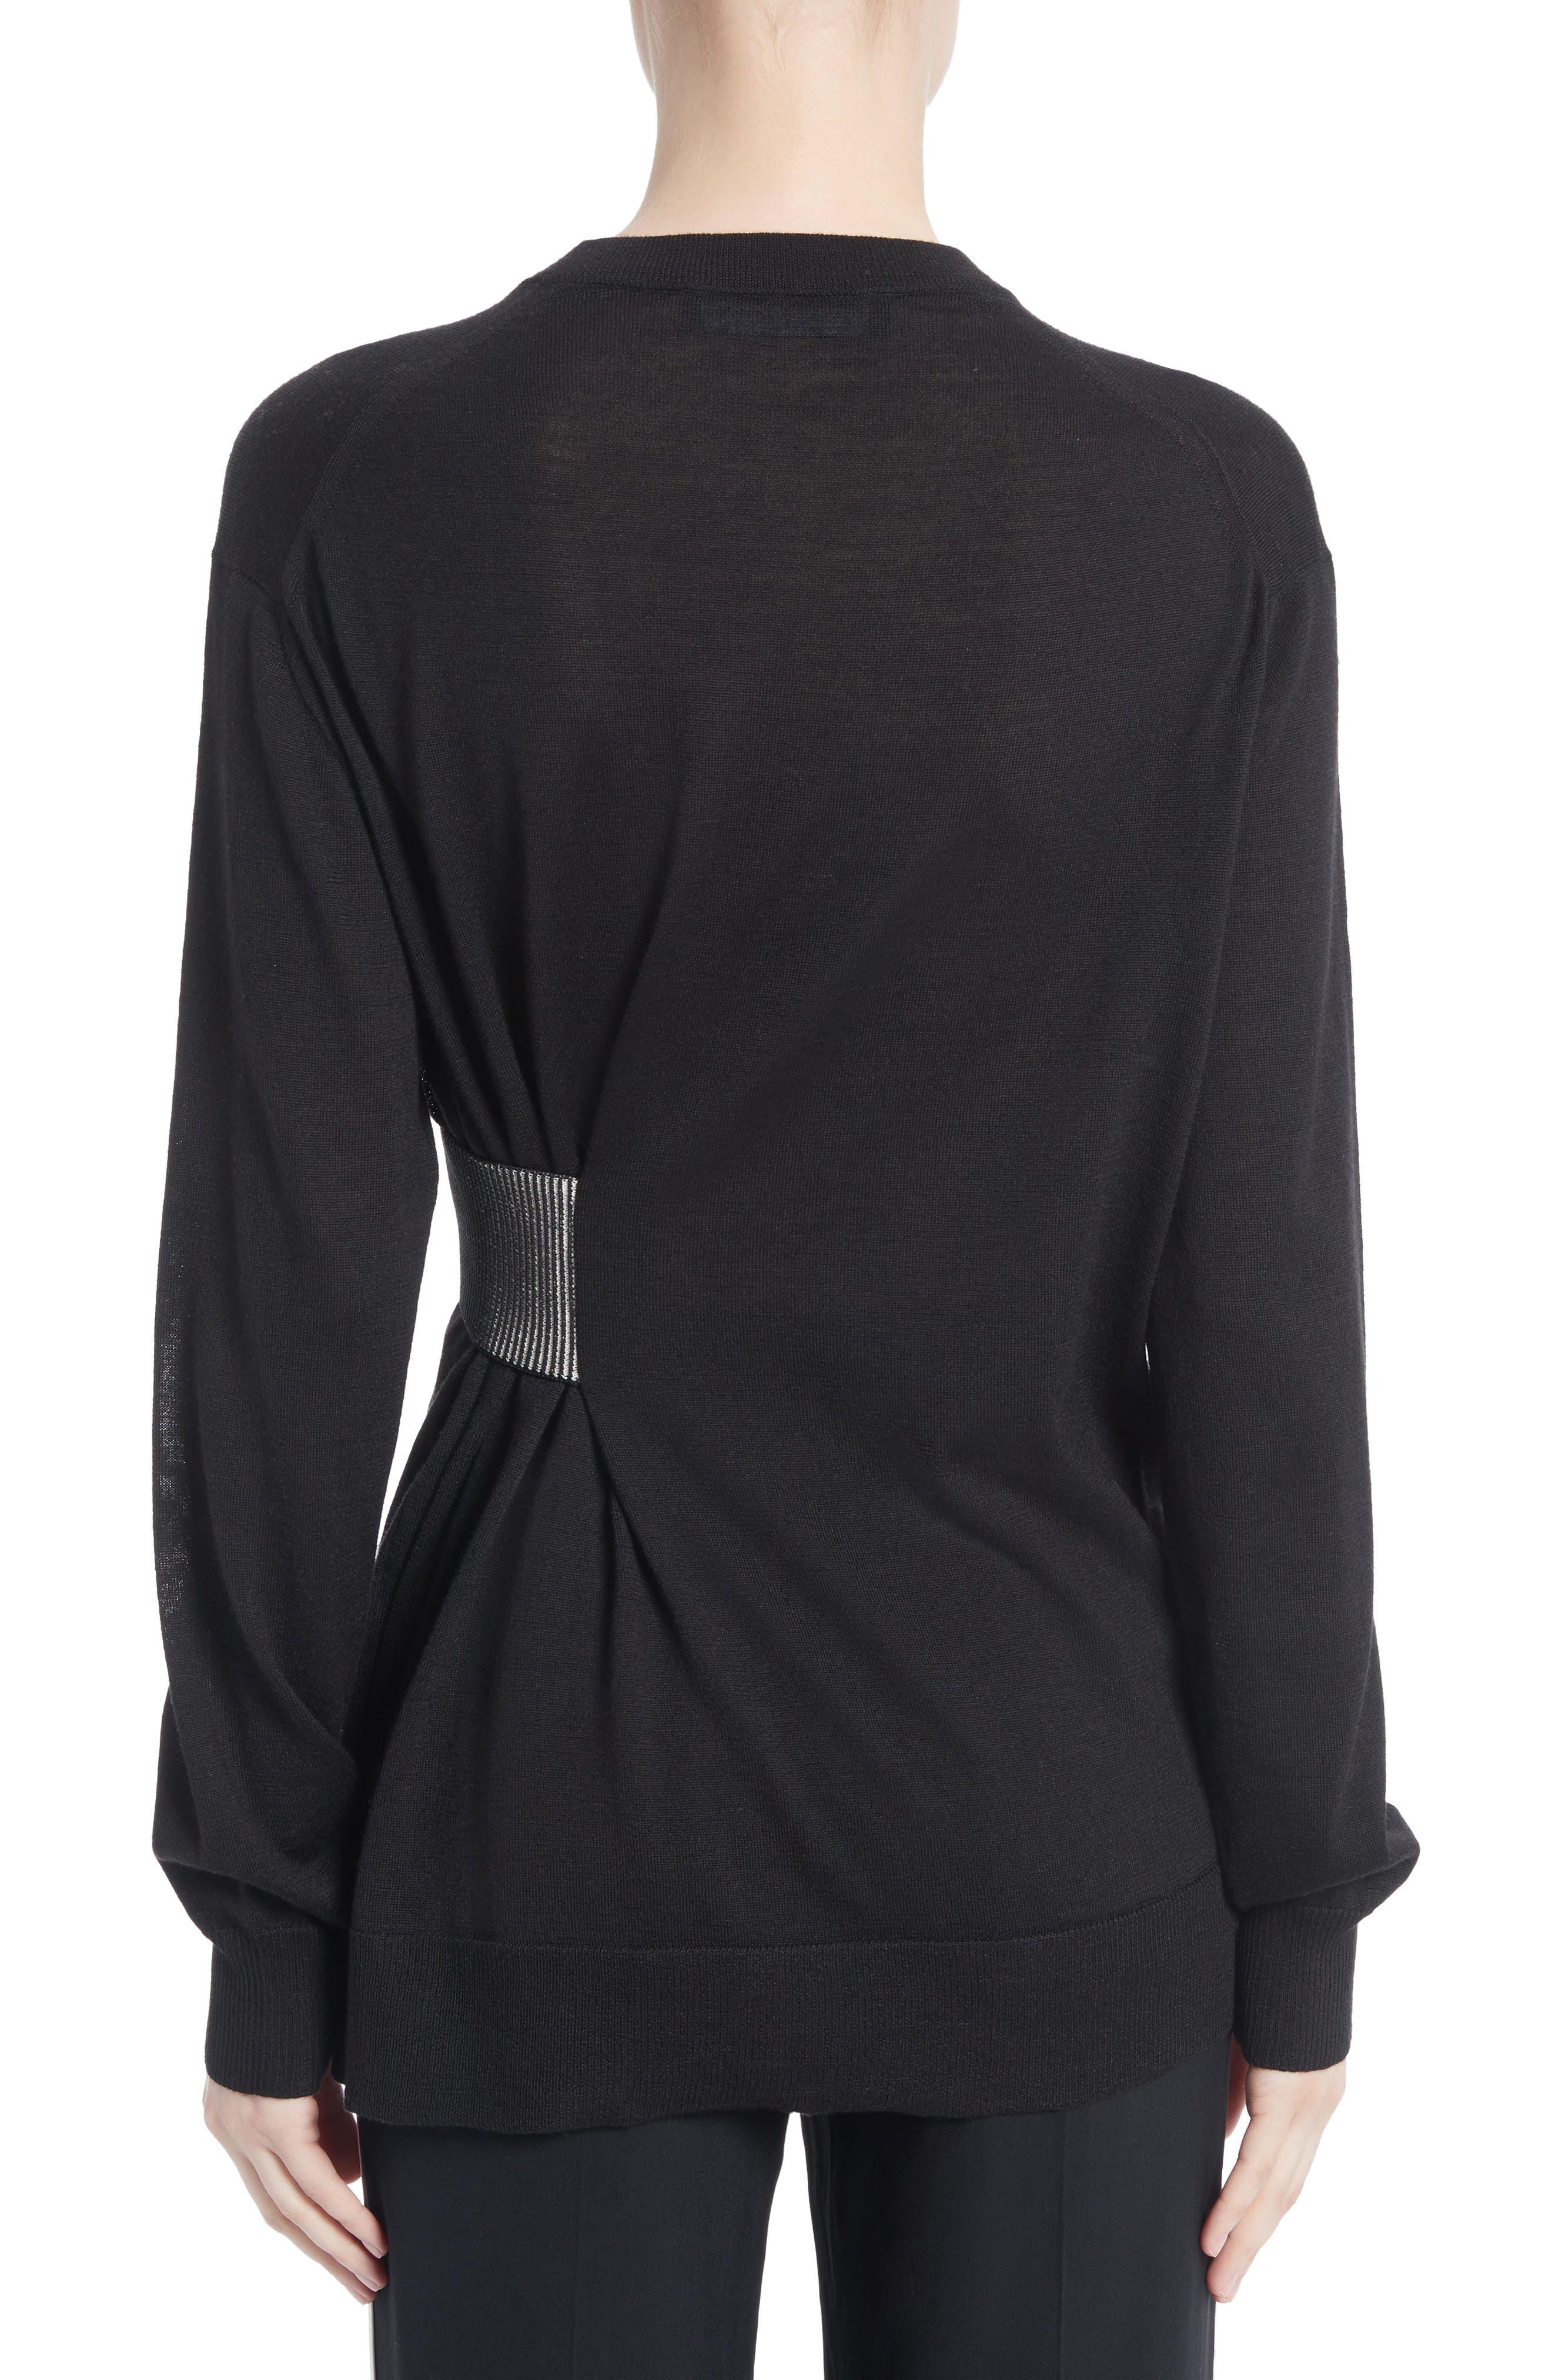 Clinch Detail Sweater,                             Alternate thumbnail 2, color,                             Black